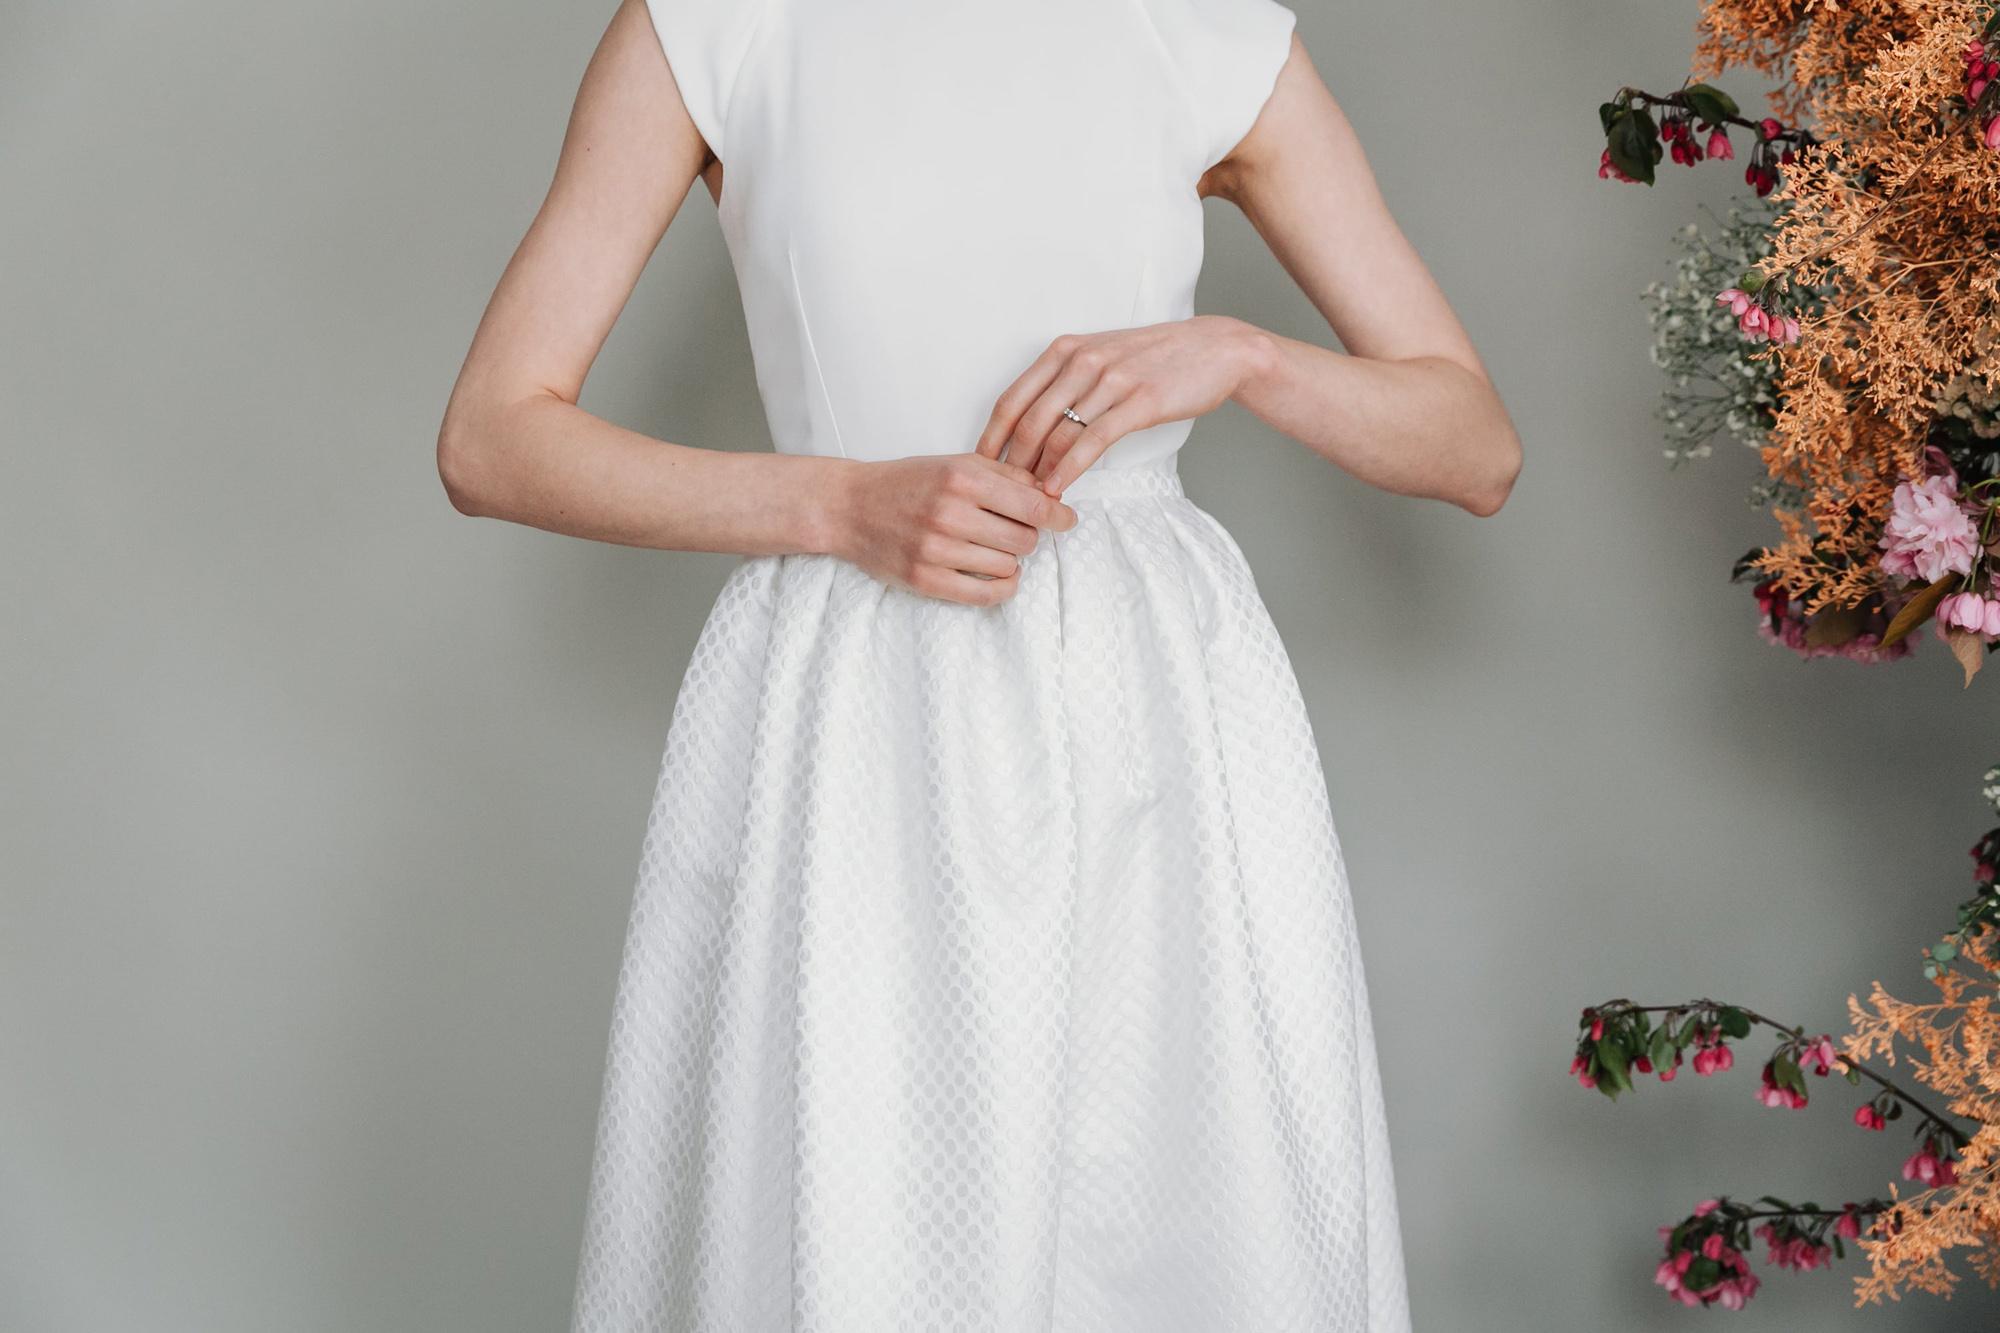 Kate-Beaumont-Sheffield-Zinnia-Modern-Wedding-Gown-Polka-Dot-Pleated-Skirt-5.jpg